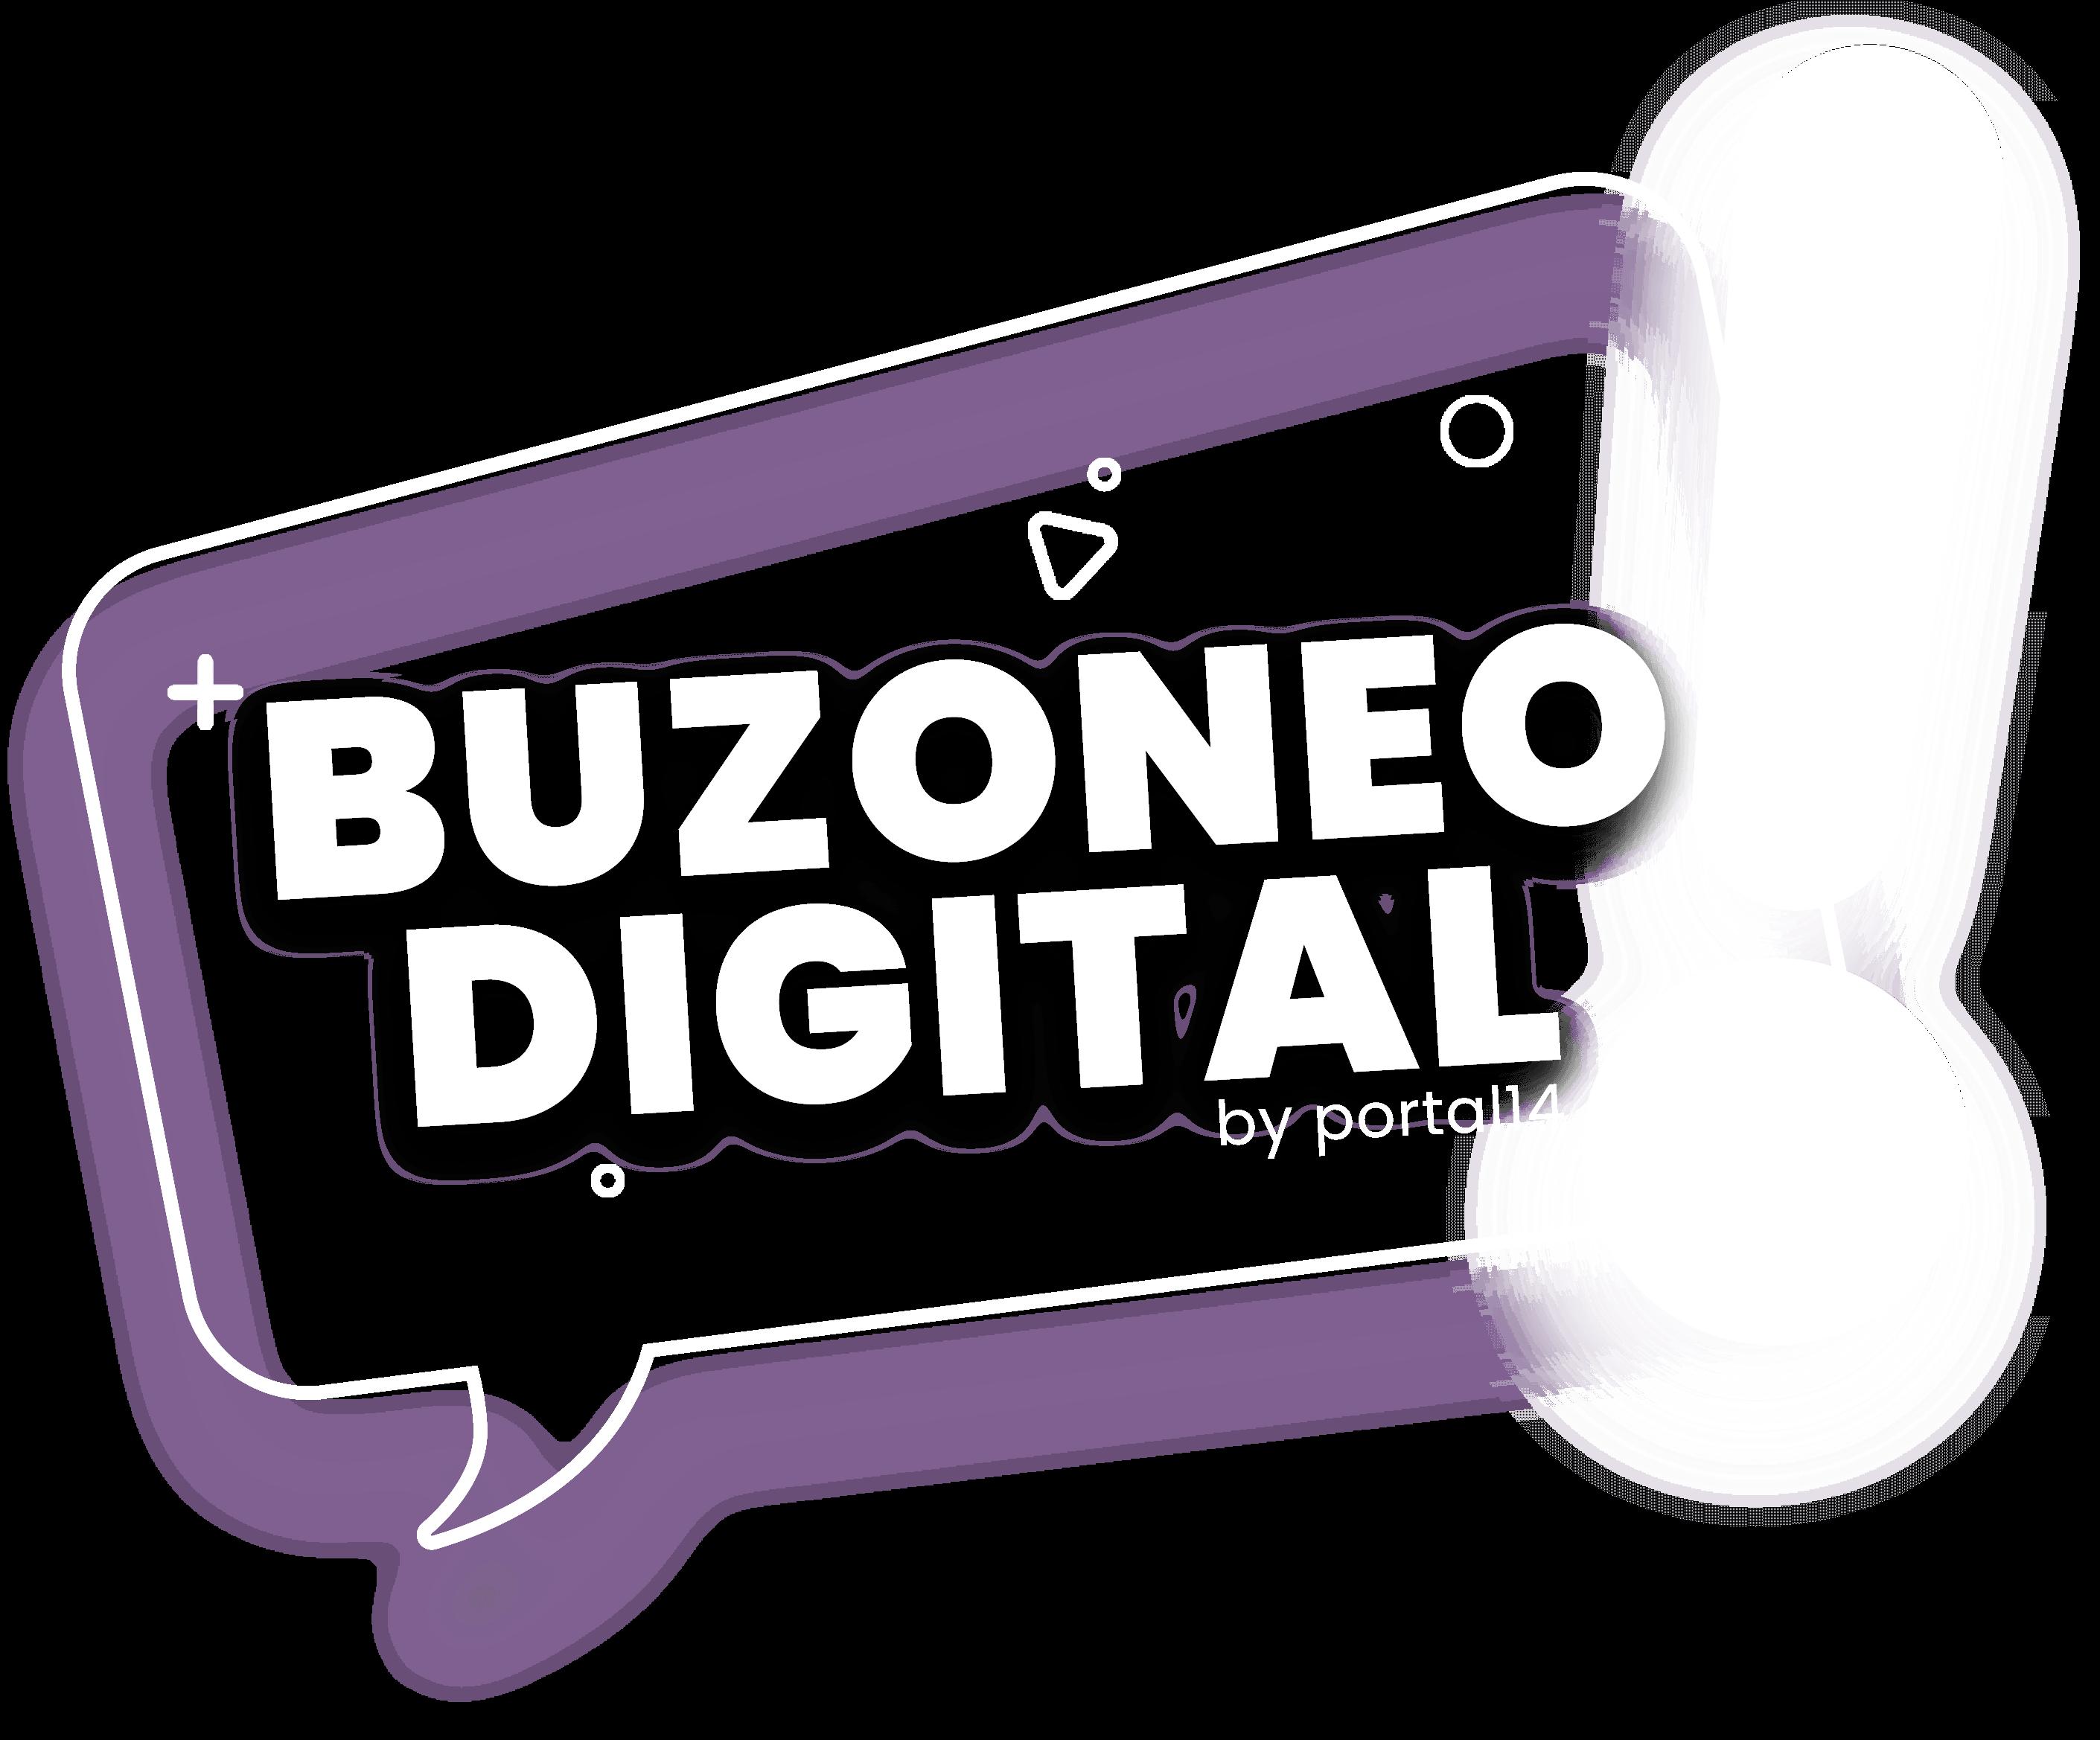 Buzoneo Digital